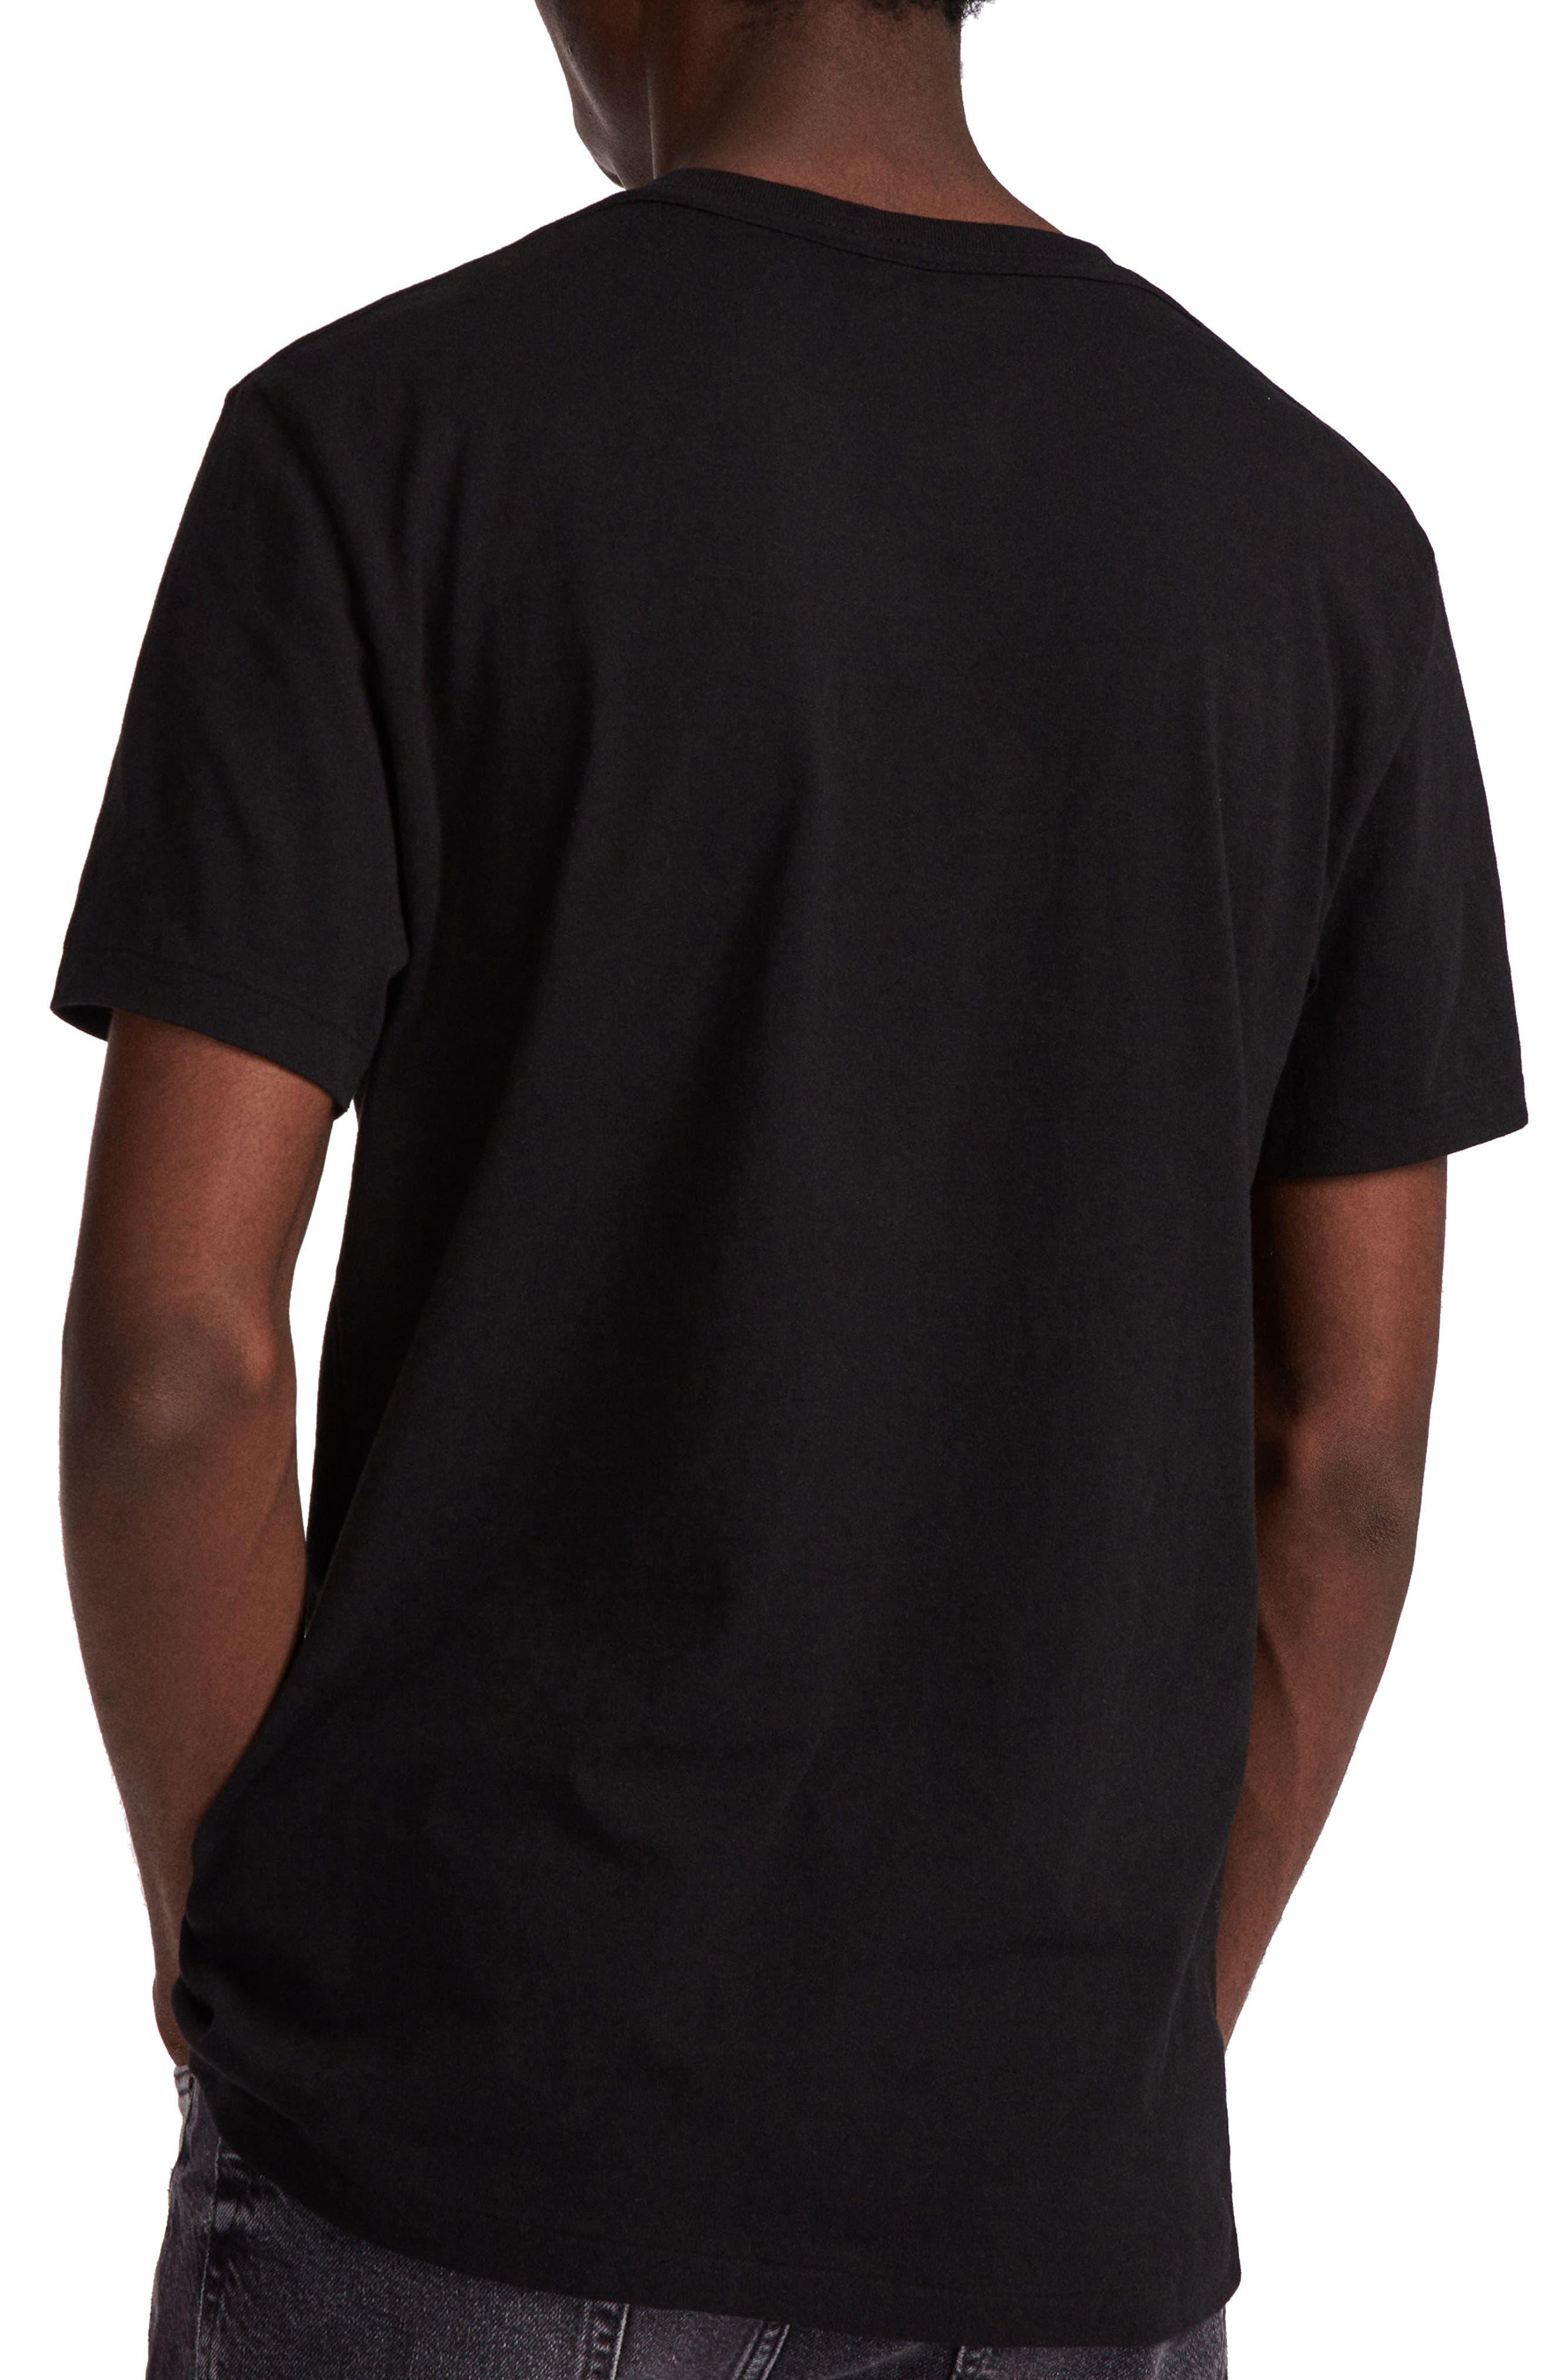 Cure Tonic Slim Fit Pocket T-Shirt,                             Alternate thumbnail 2, color,                             003